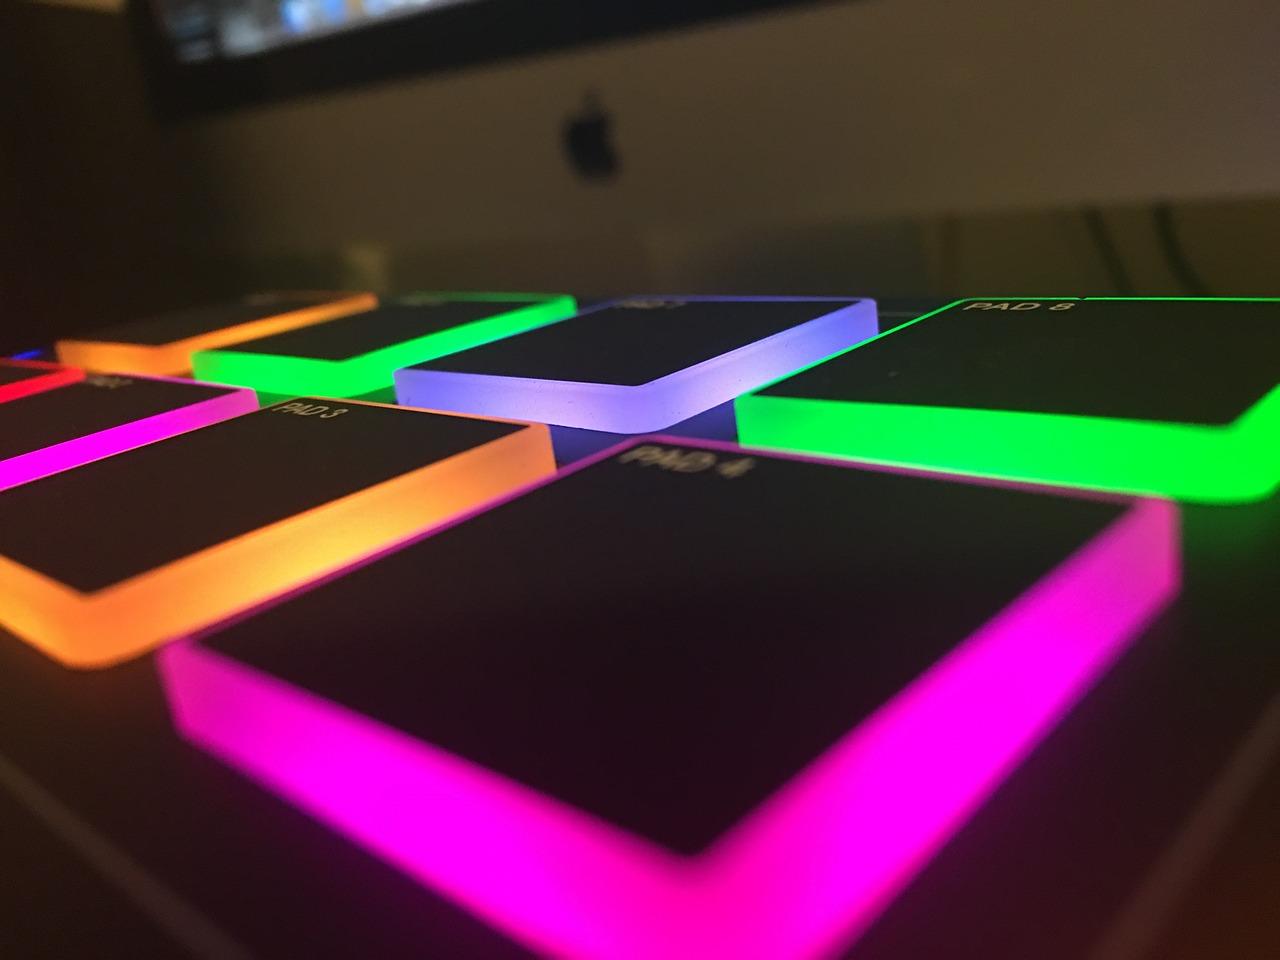 midi drum pads electronic drum advisor. Black Bedroom Furniture Sets. Home Design Ideas